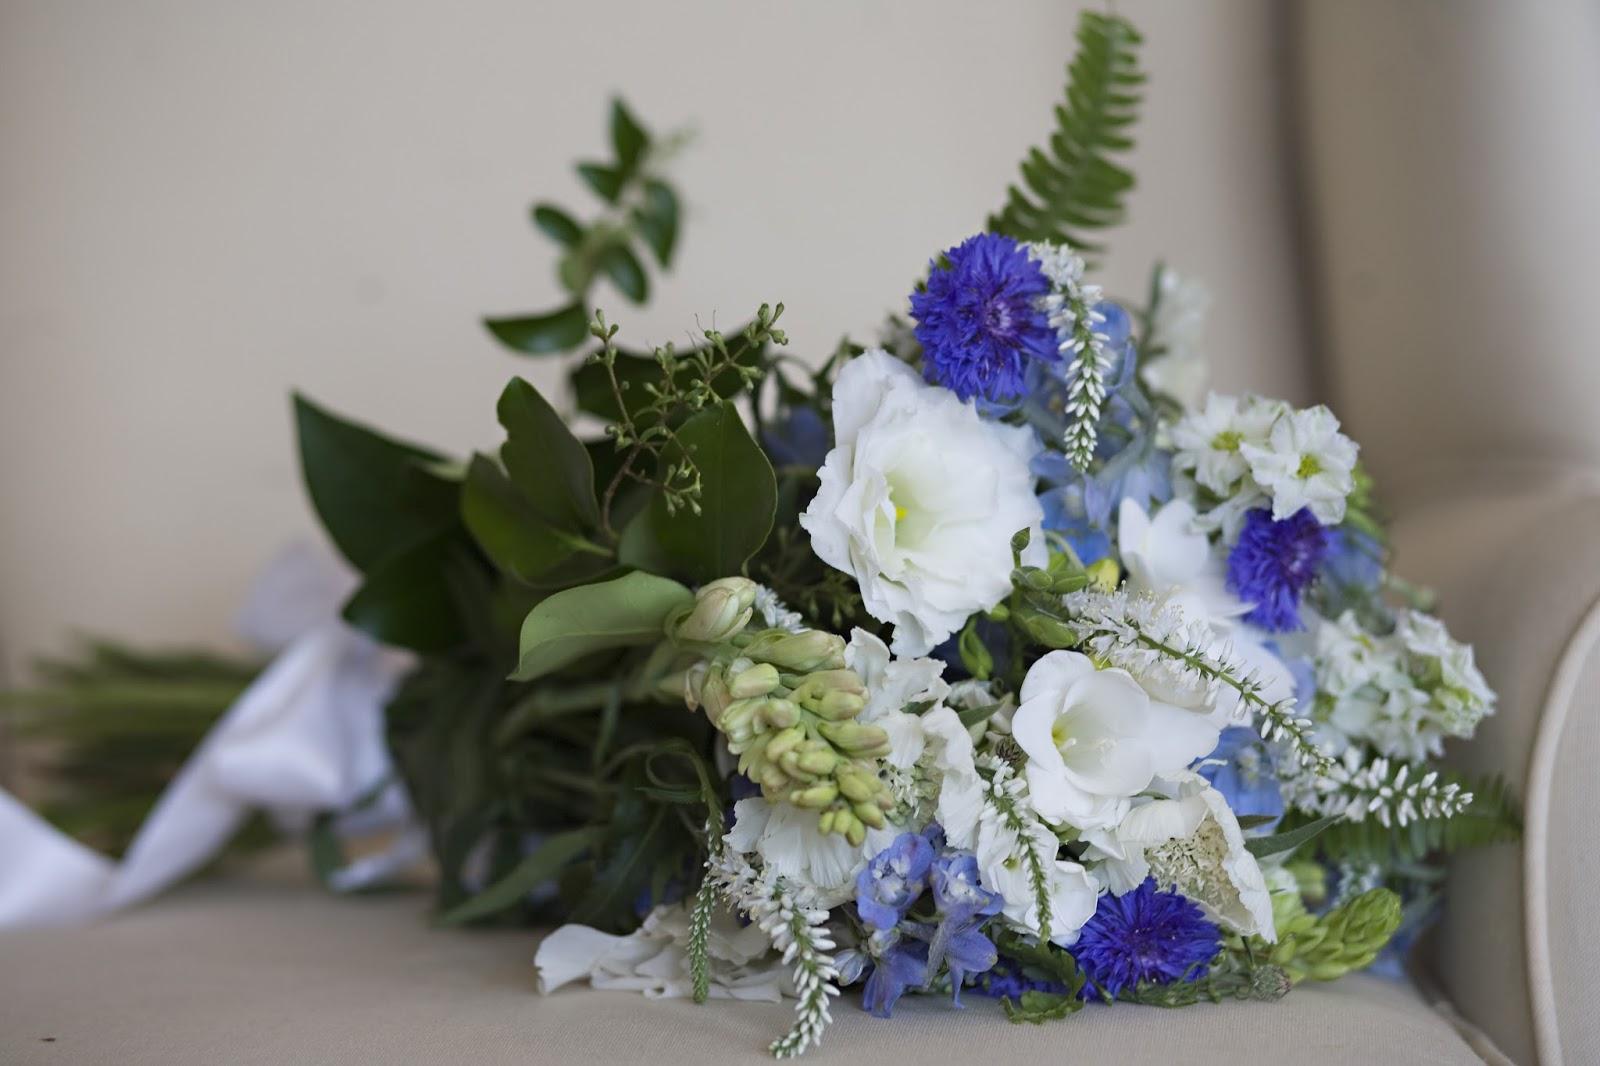 Country Rose Tallahassee Florist Wedding Flowers Tallahassee Florist